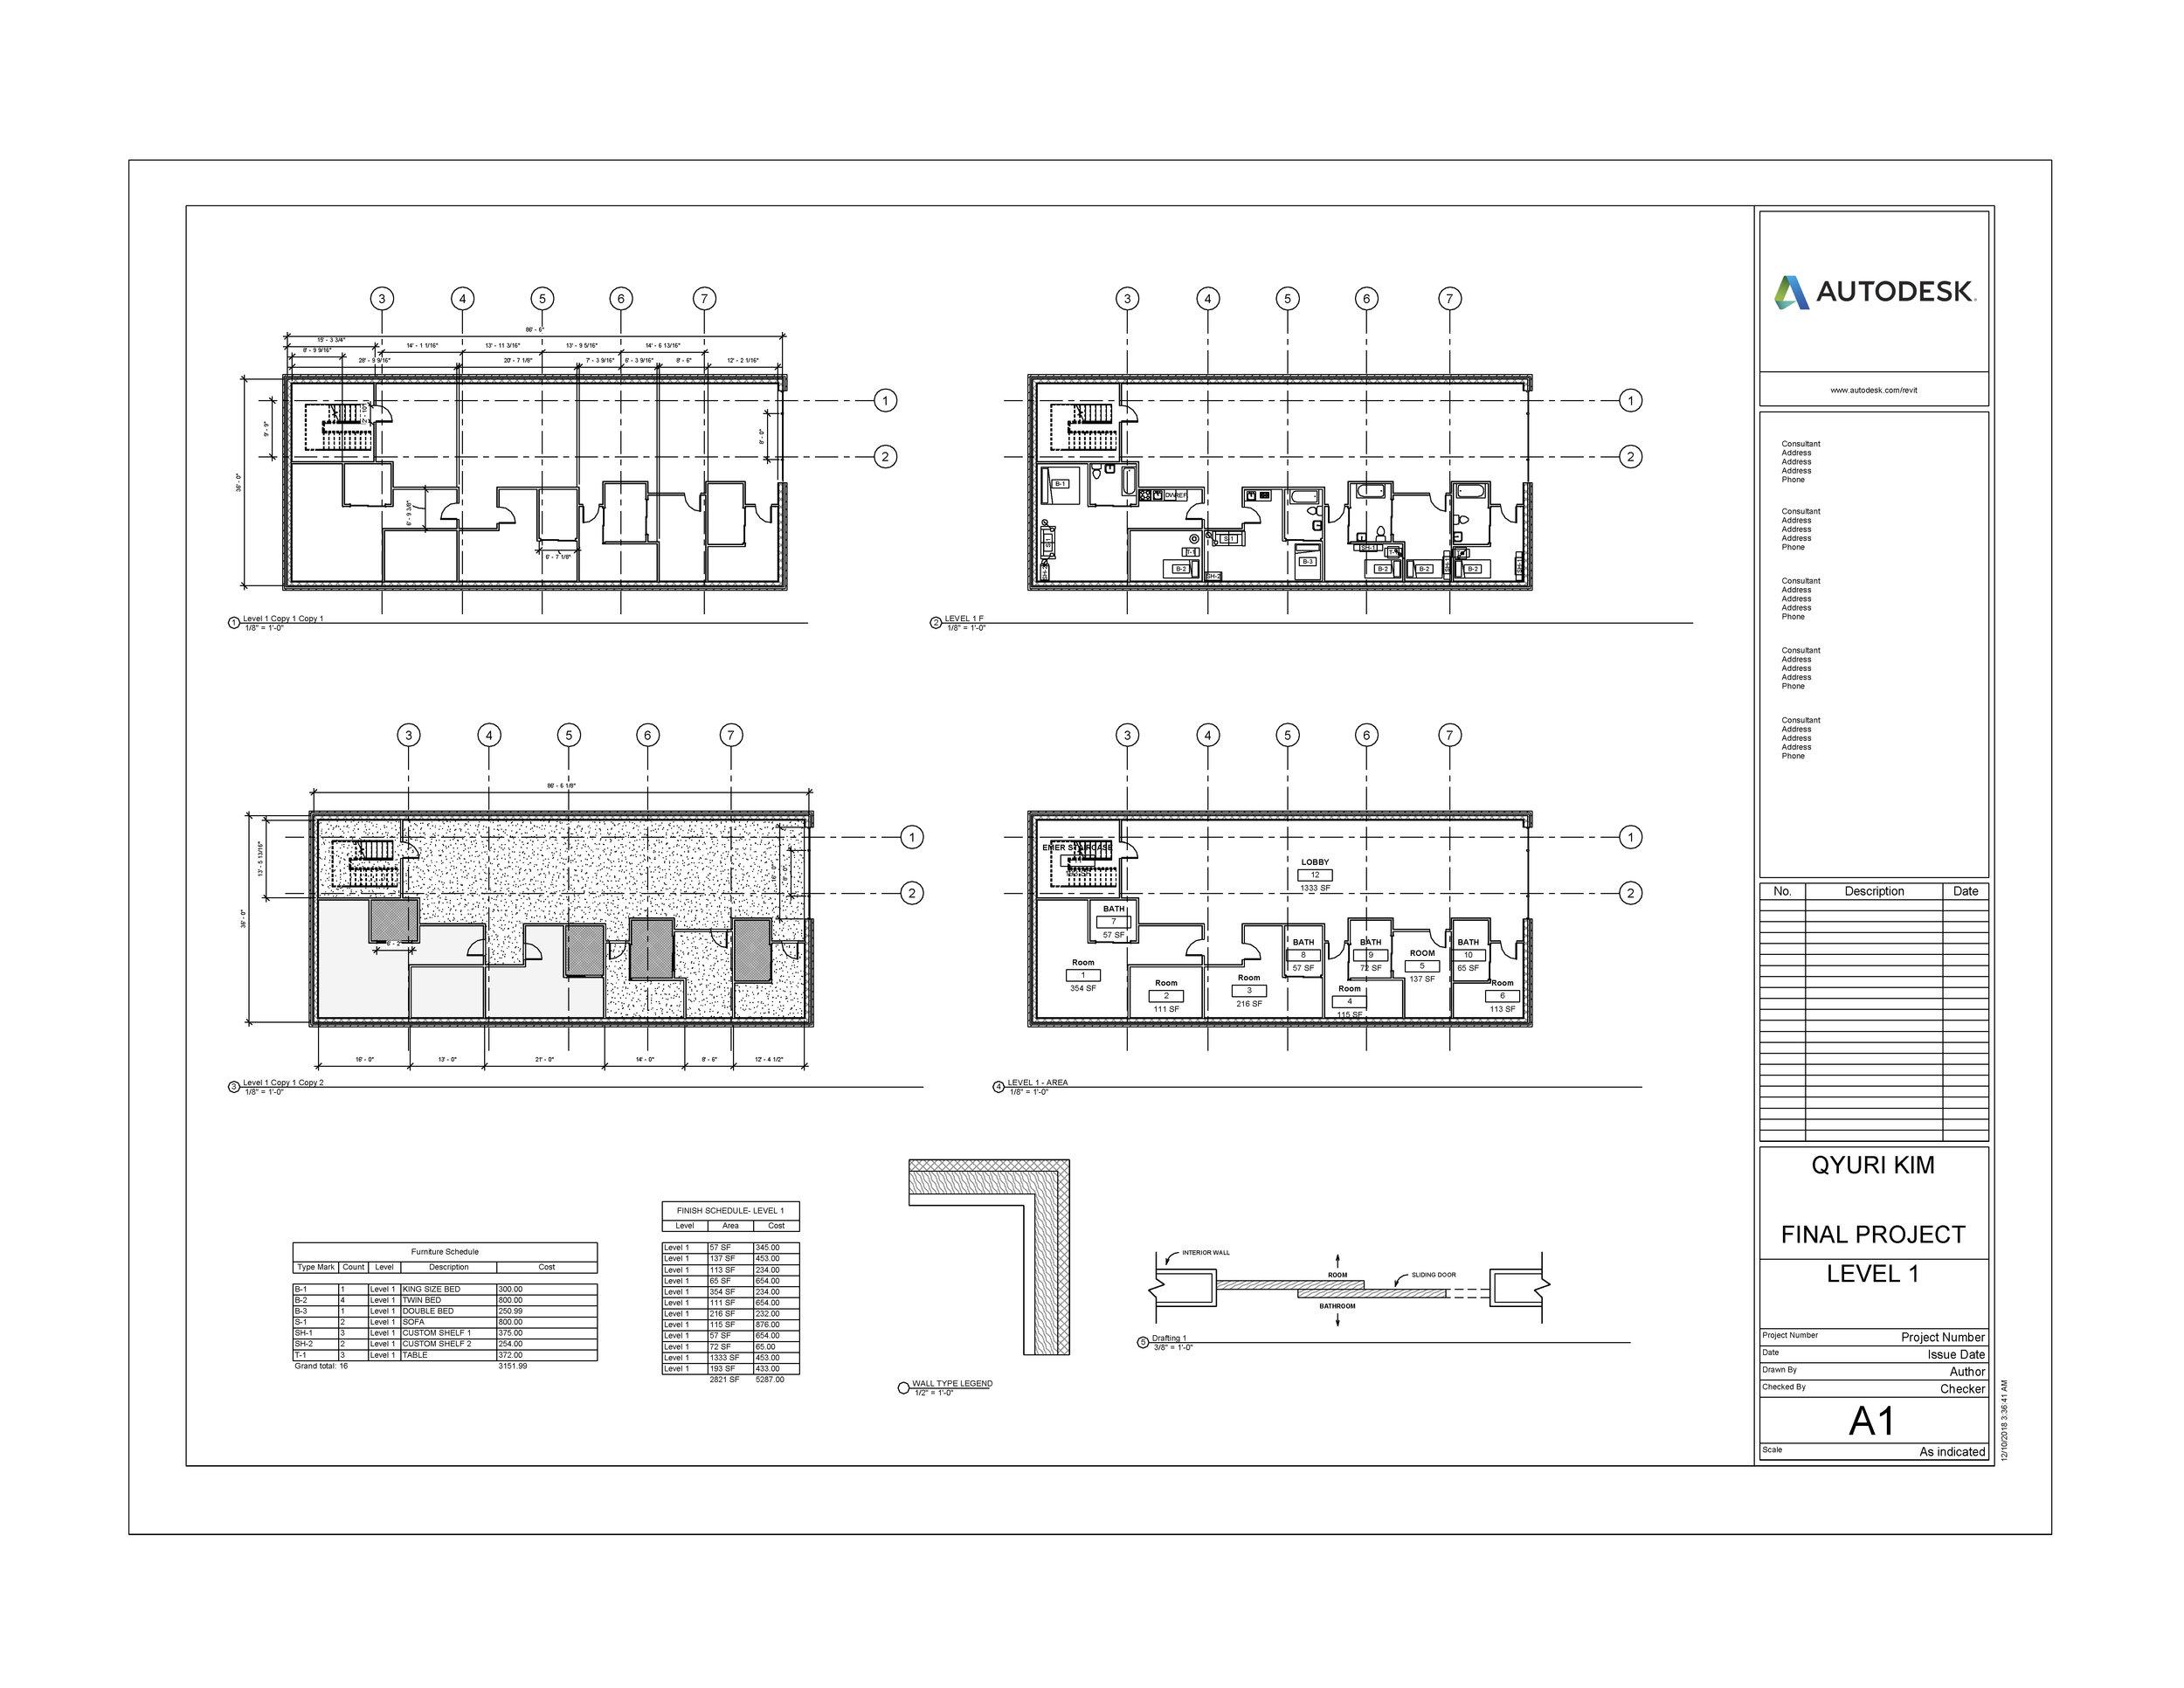 Windows 10 printed document-1.jpg